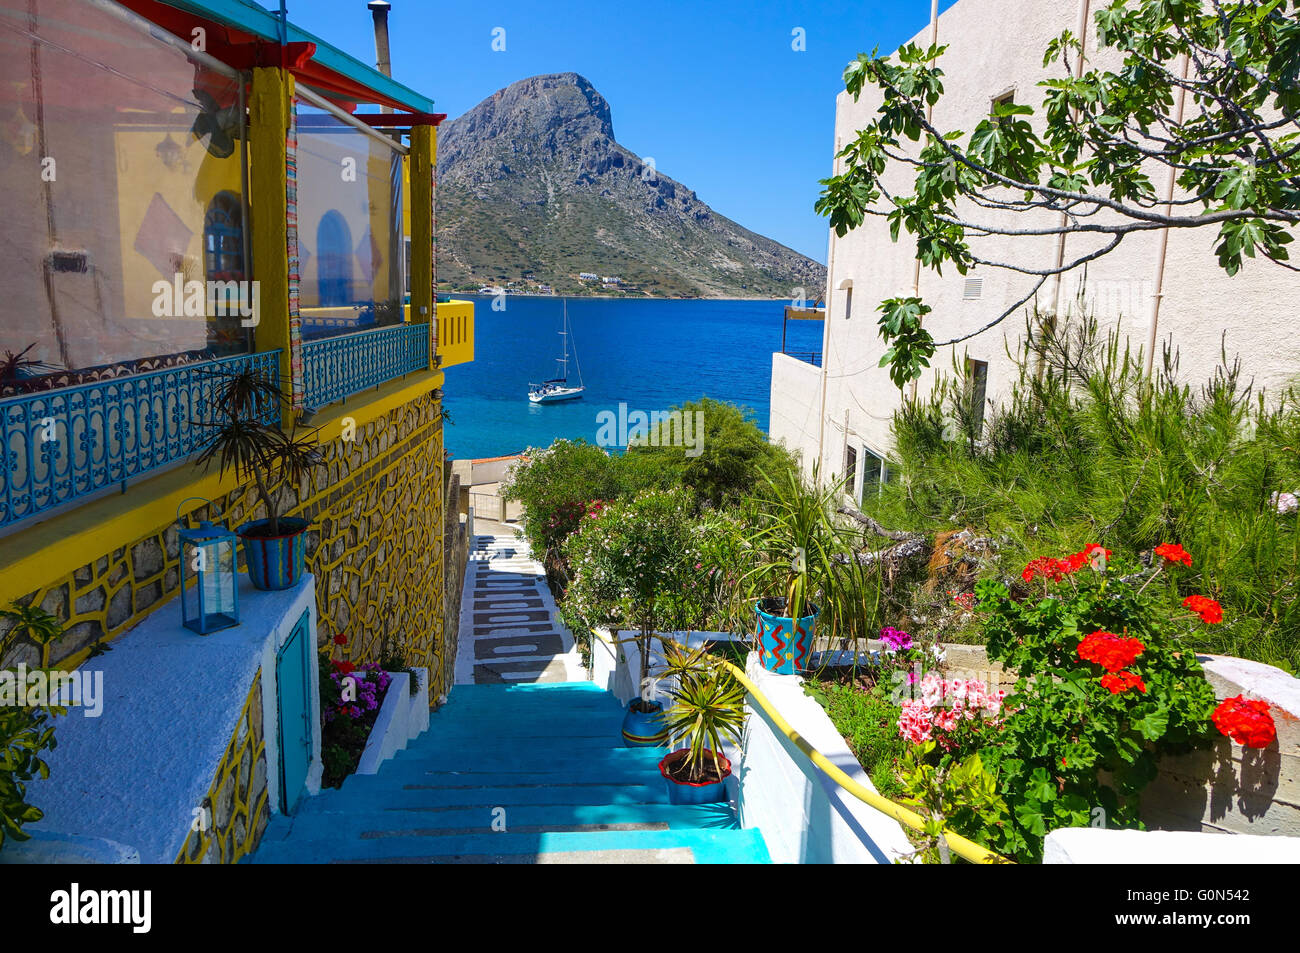 massouri holiday resort kalymnos greece with blue steps moored